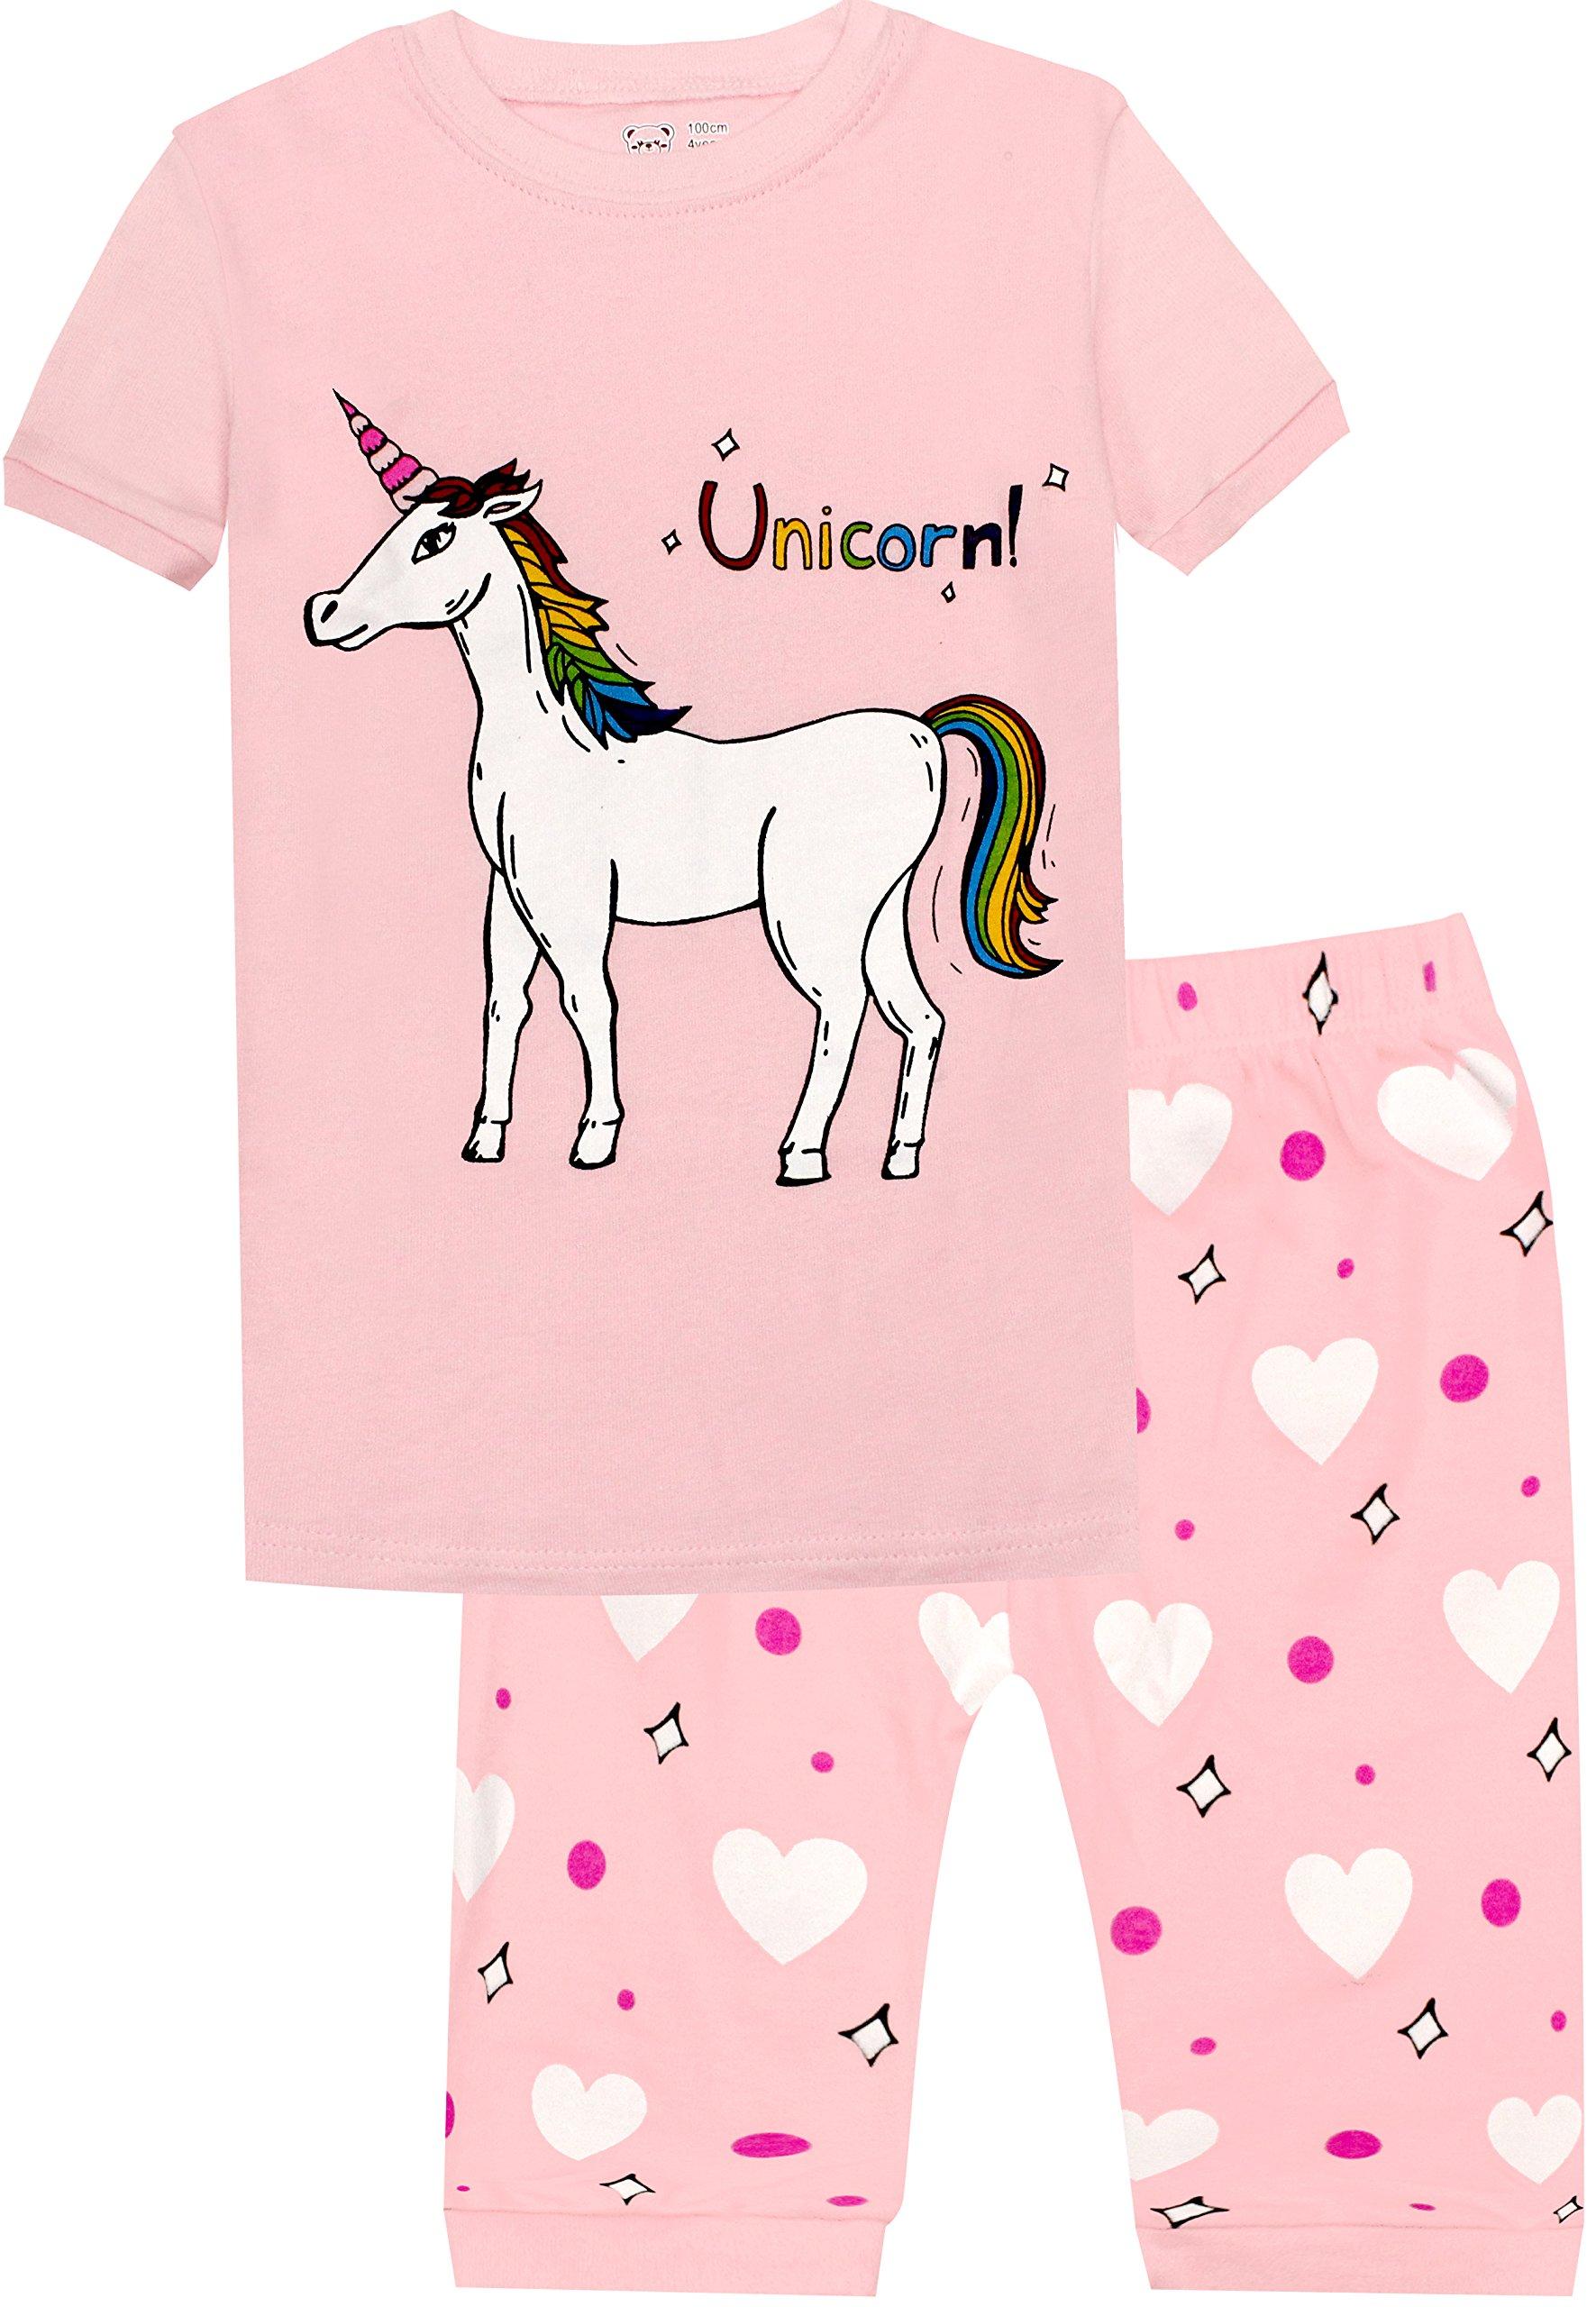 Girls Horse Pajamas Toddler Kids Cotton Sleepwear Children 2 Piece Short Set Size 8 Years